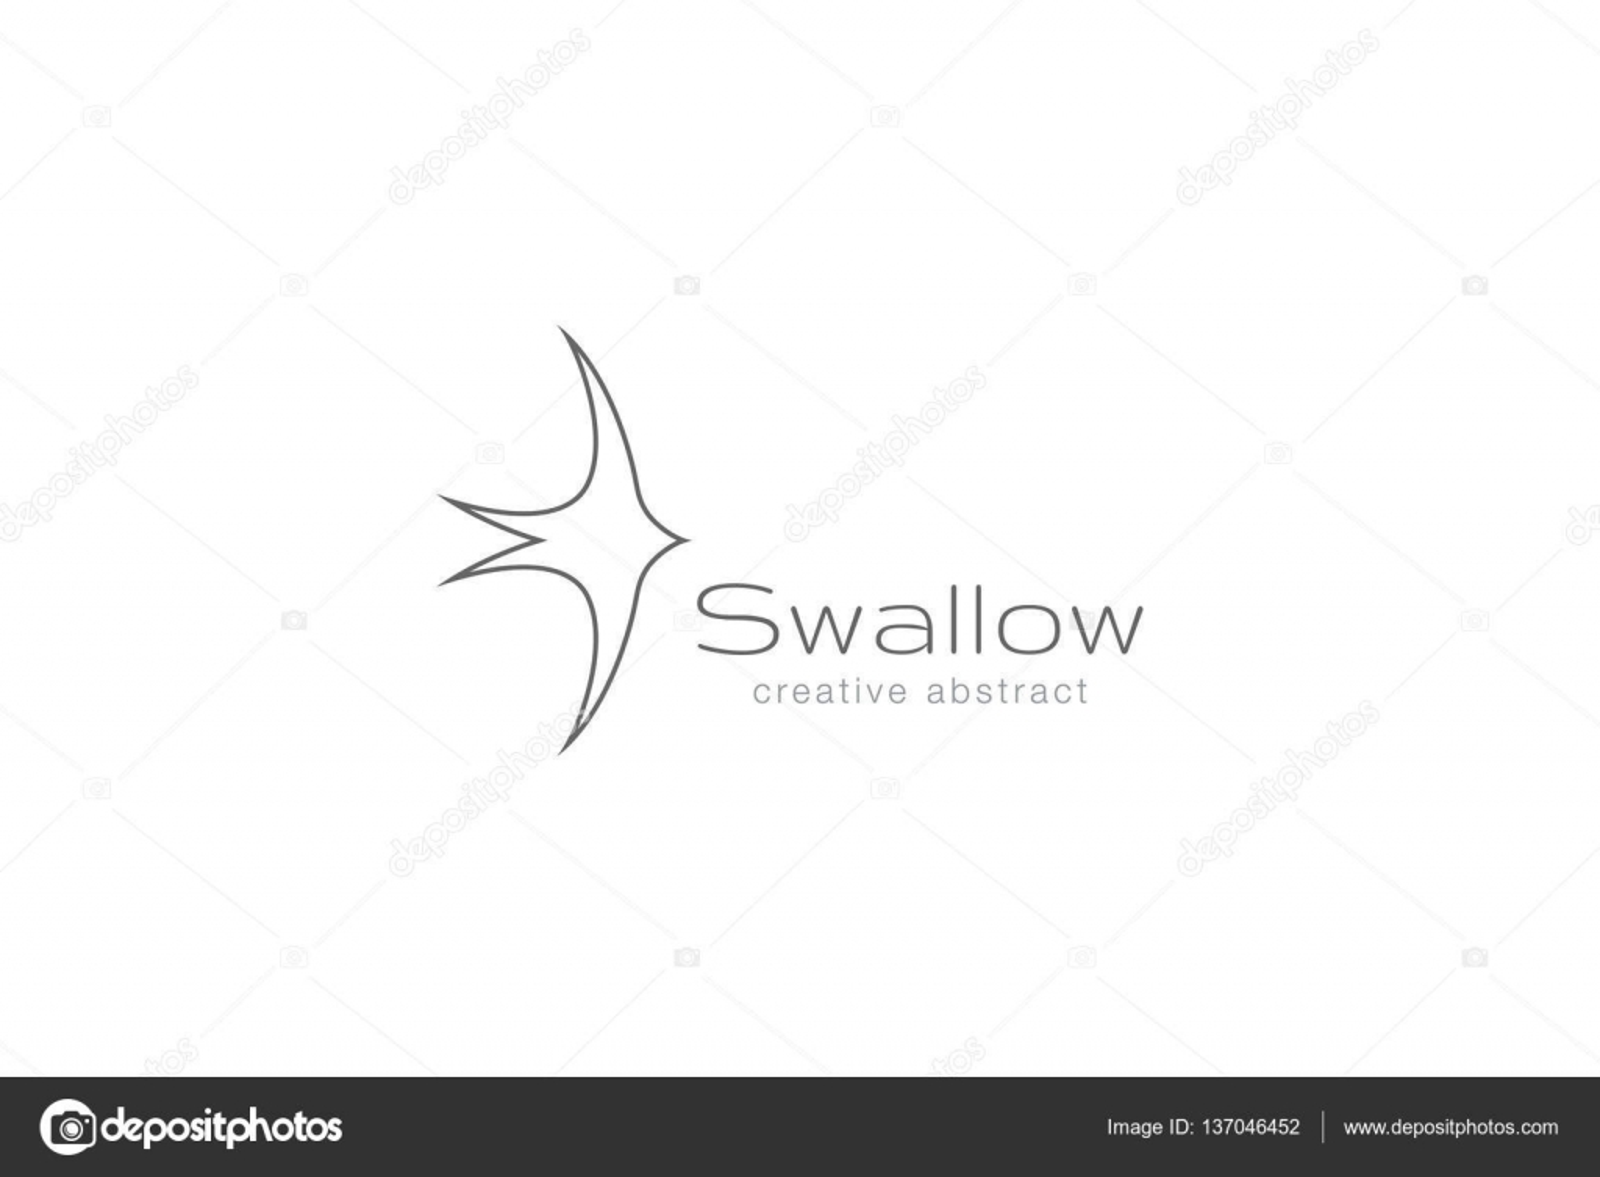 swallow business logo stock vector c sentavio 137046452 depositphotos